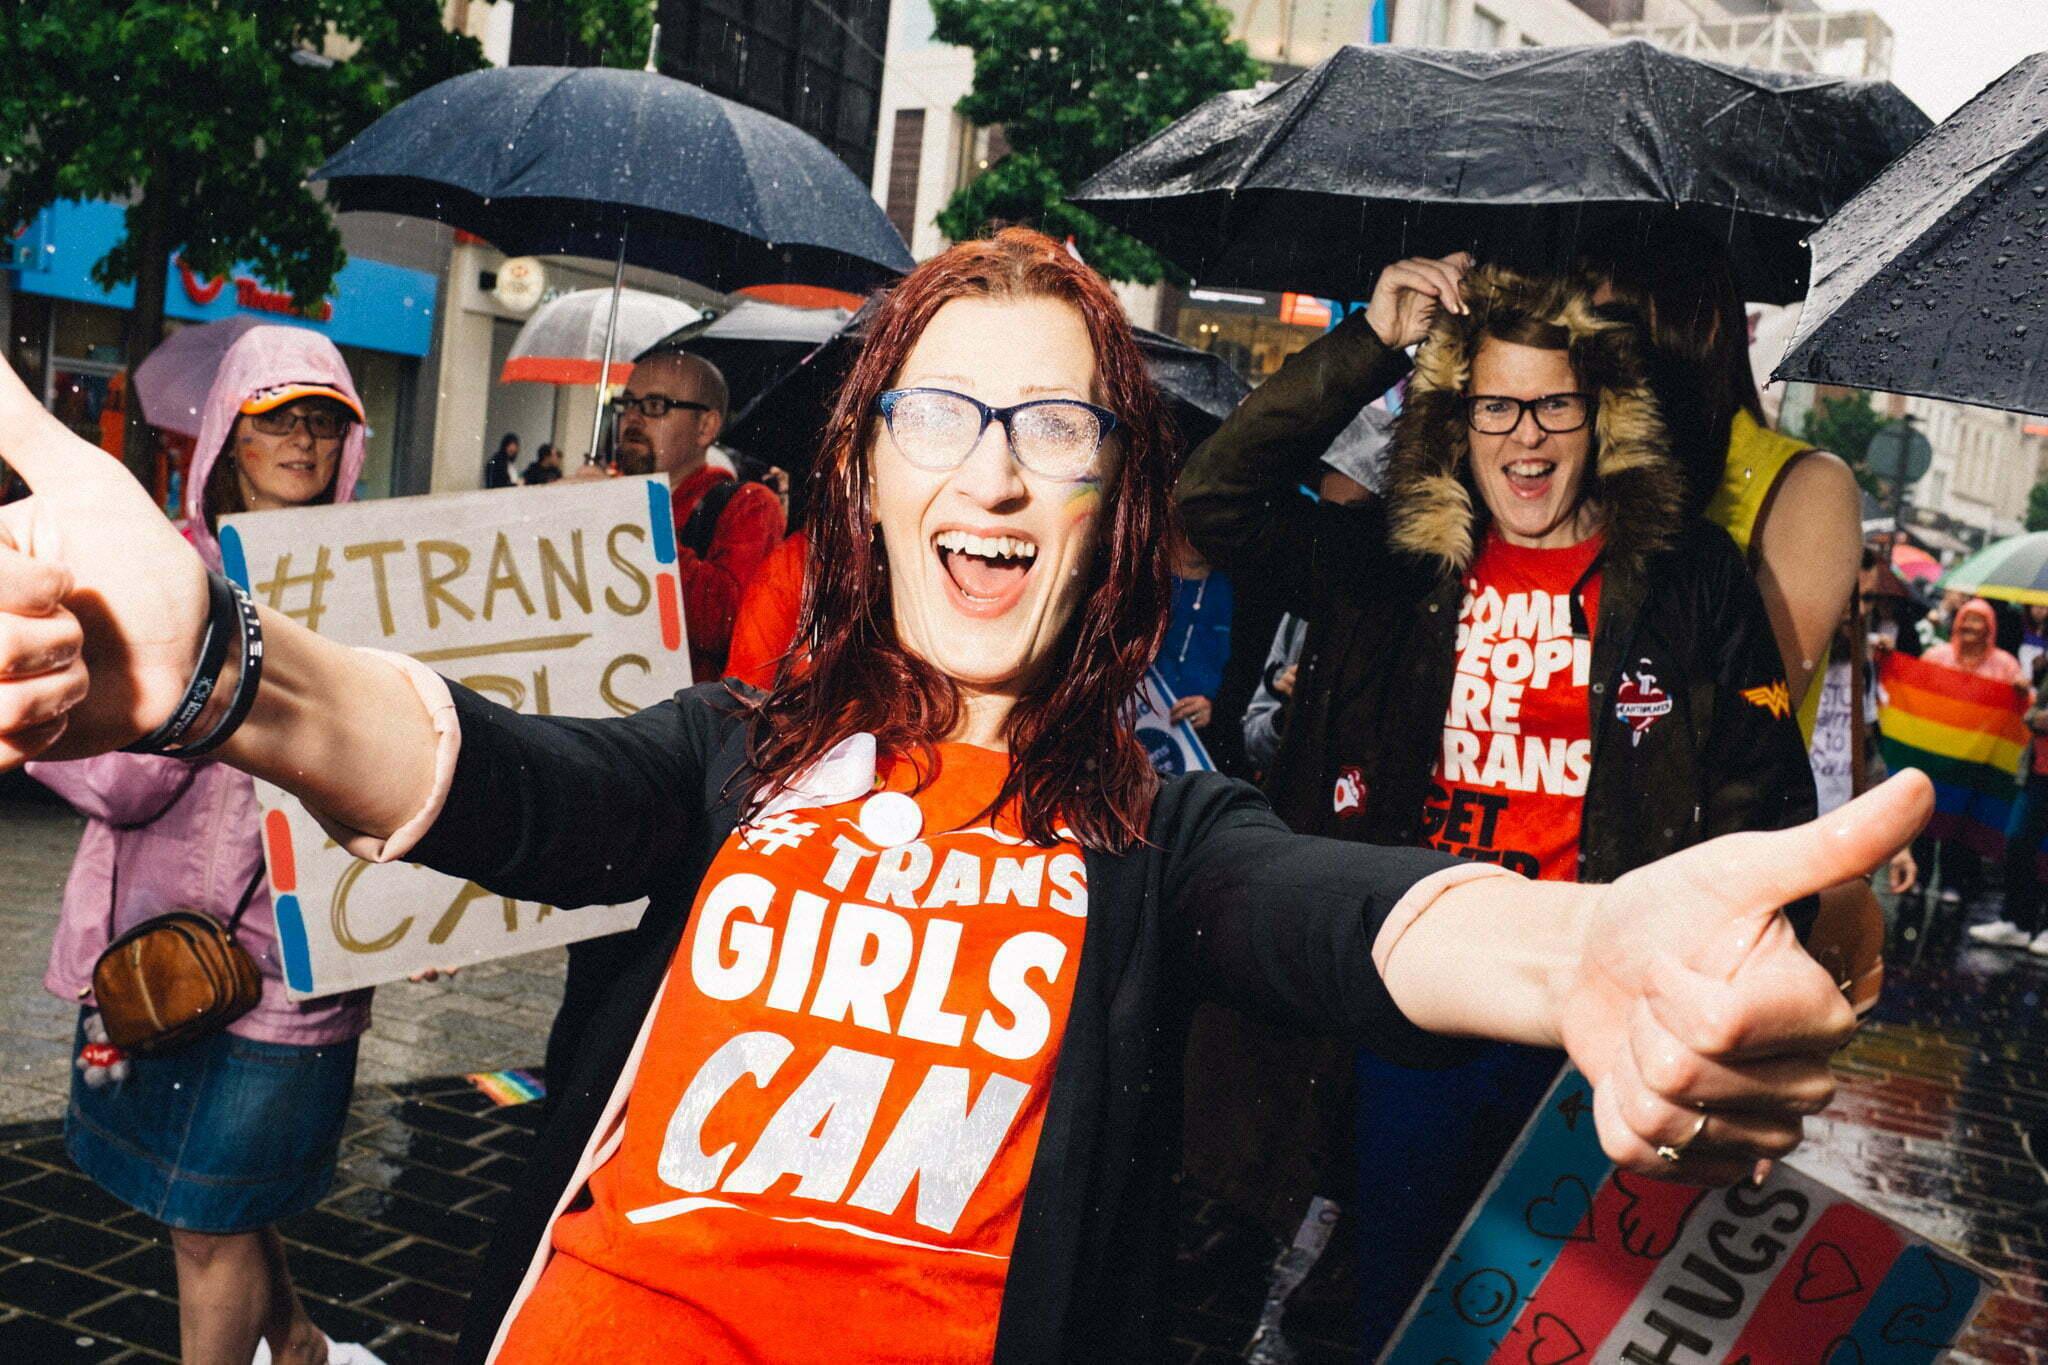 Liverpool-Pride-2015-6979-pete-carr